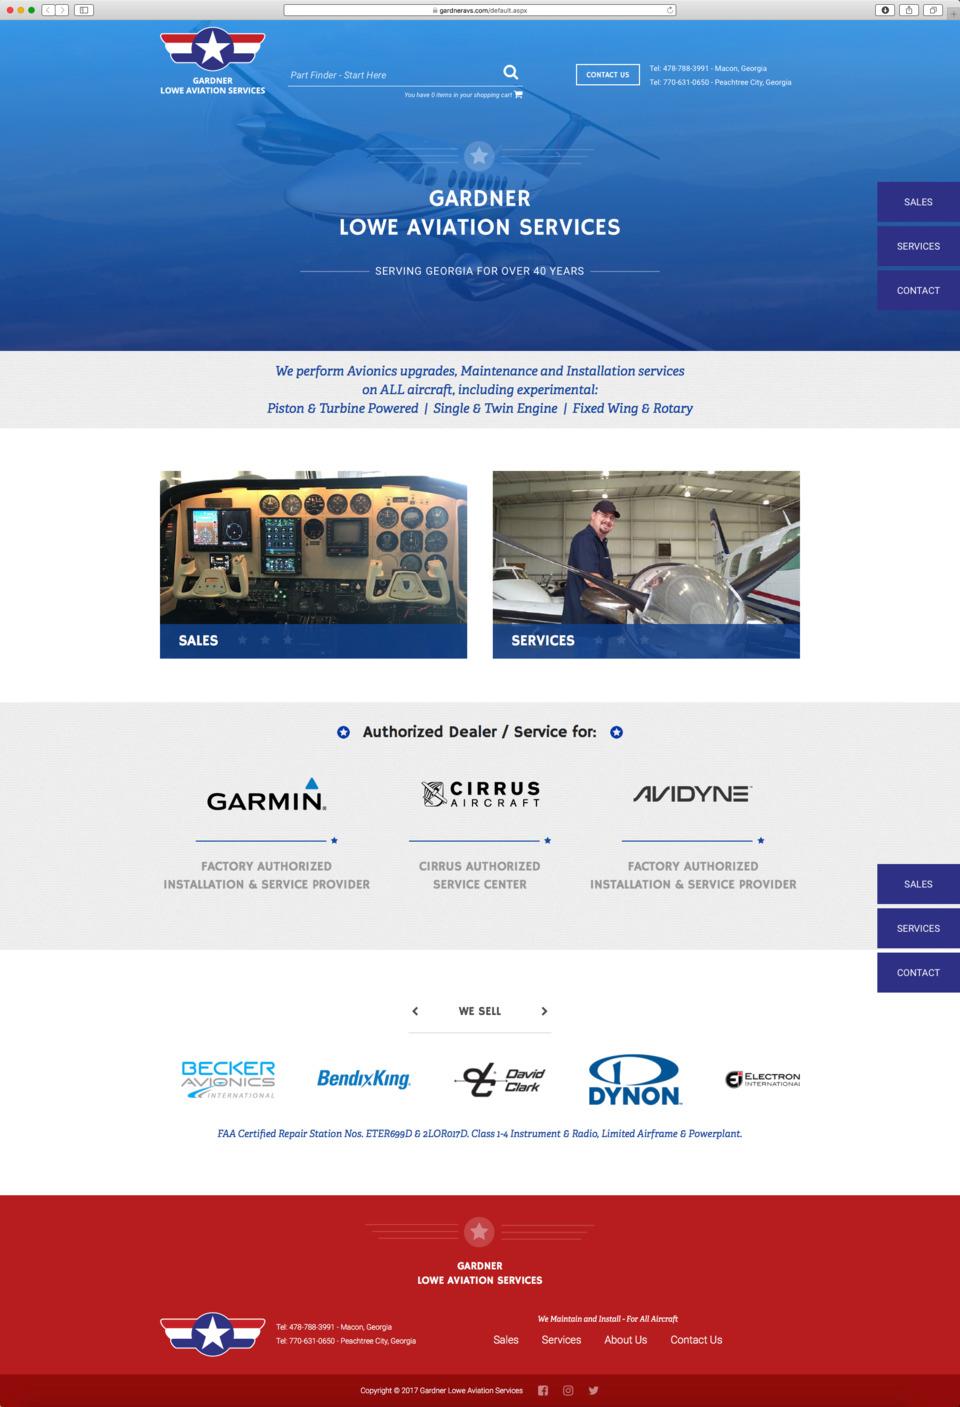 4fa9eb7e91c Gardneravs.com Launches Online Avionics and Pilot Supplies Shop